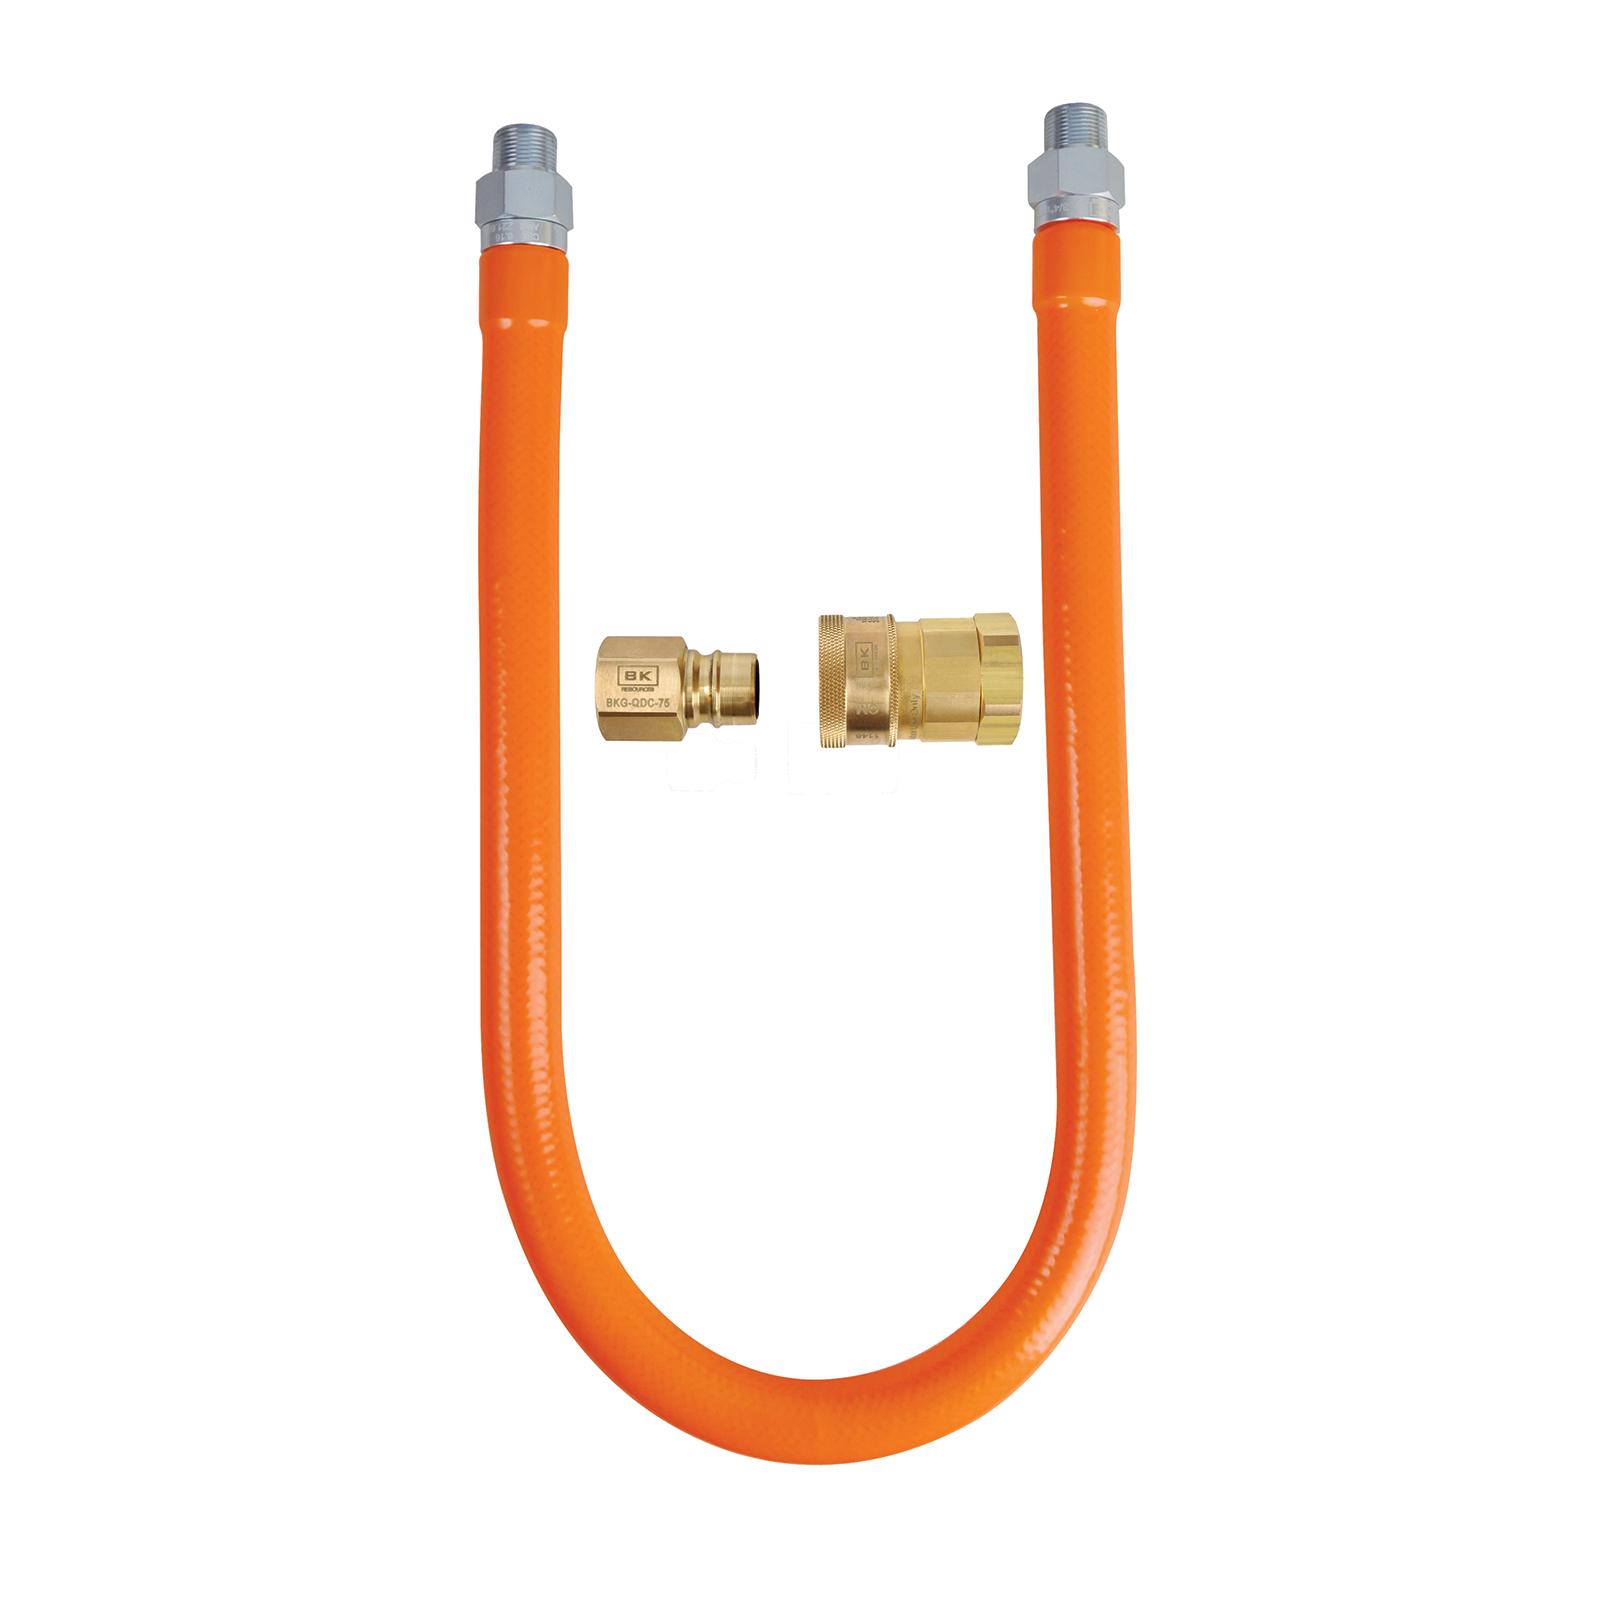 BK Resources BKG-GHC-5060-QD-PT gas connector hose kit